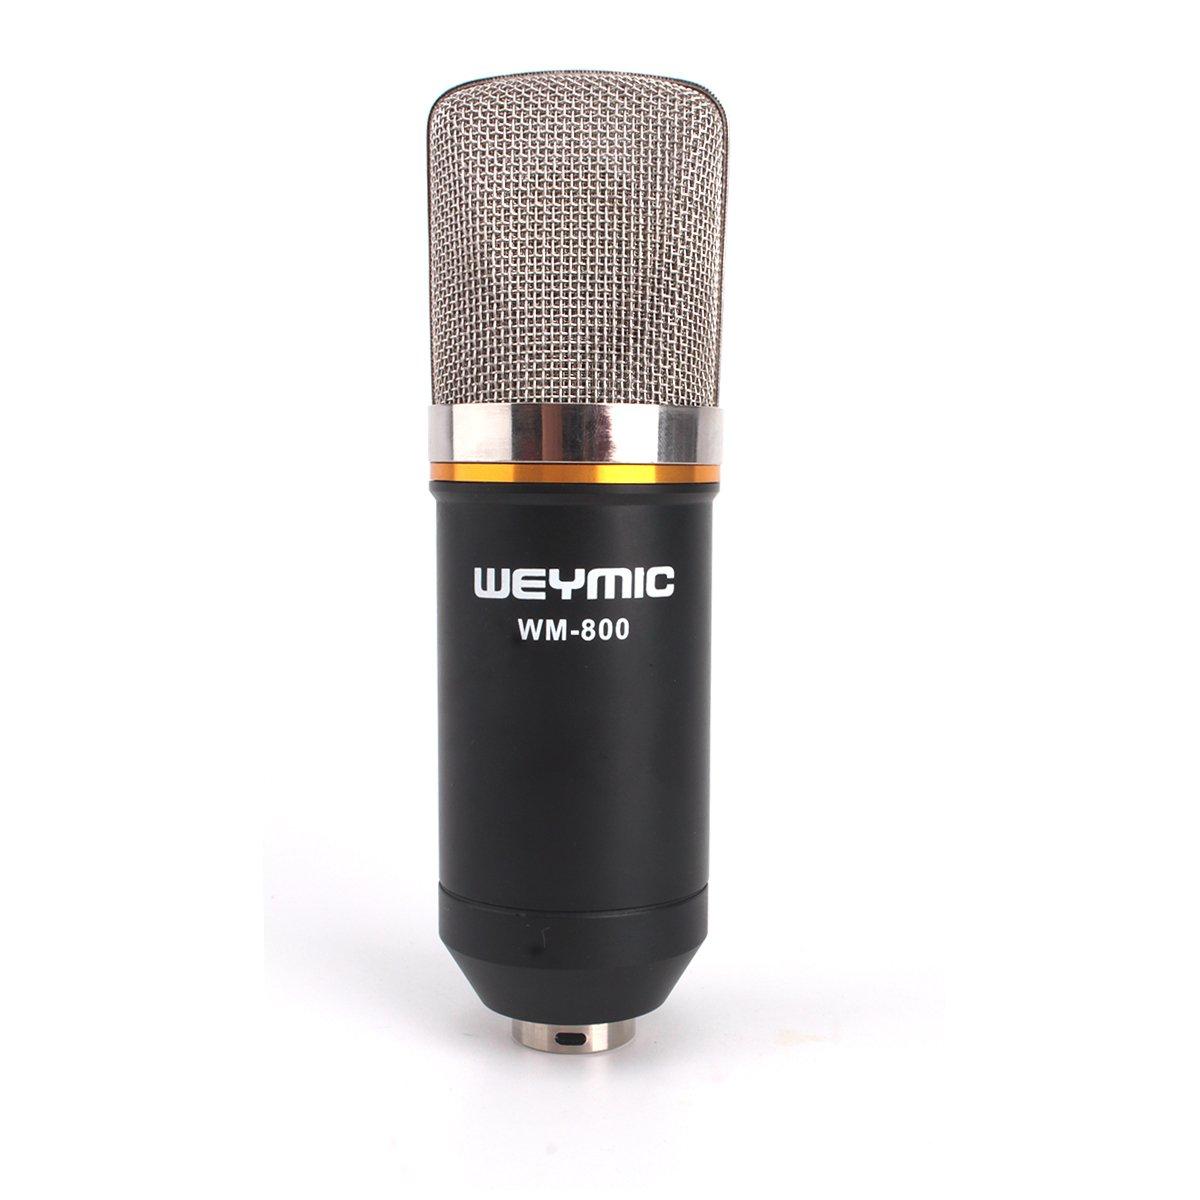 ZRAMO Large Diagram Condenser Mics Recording Microphone Studio Professional mic for Computer PC Use, Best Recording Studio Equipment for Recording (black-800)